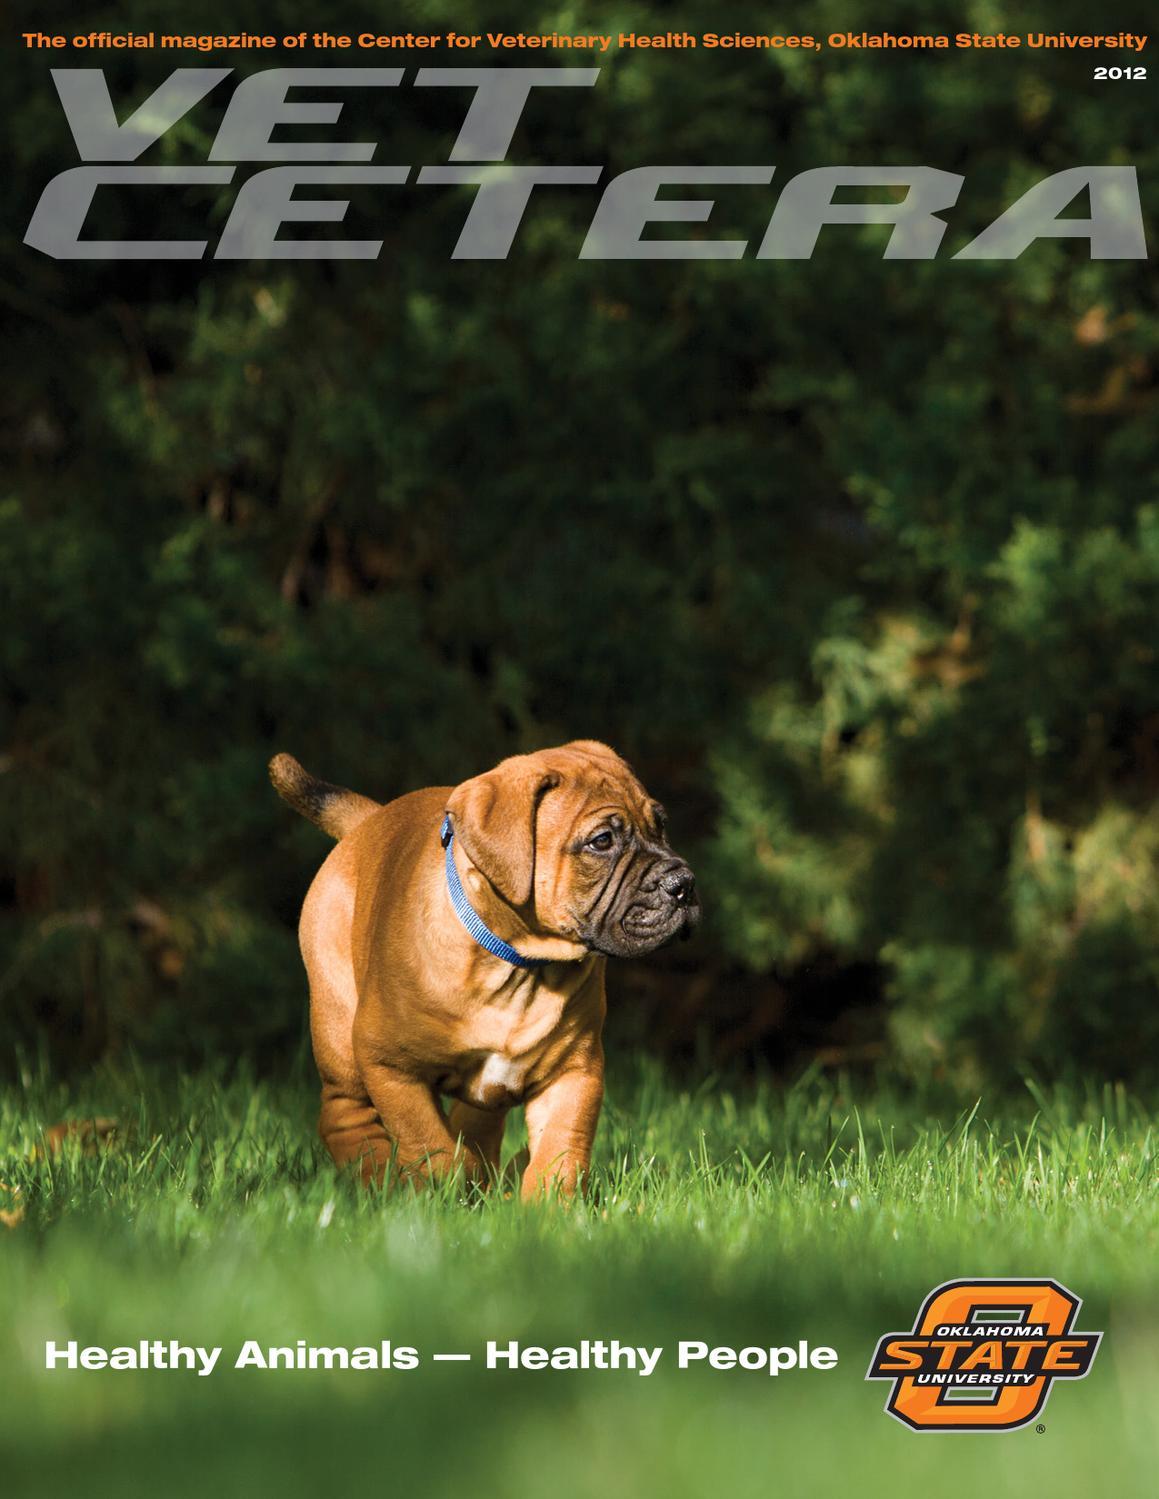 pvm report 2013 annual report by purdue university issuu vet cetera magazine 2012